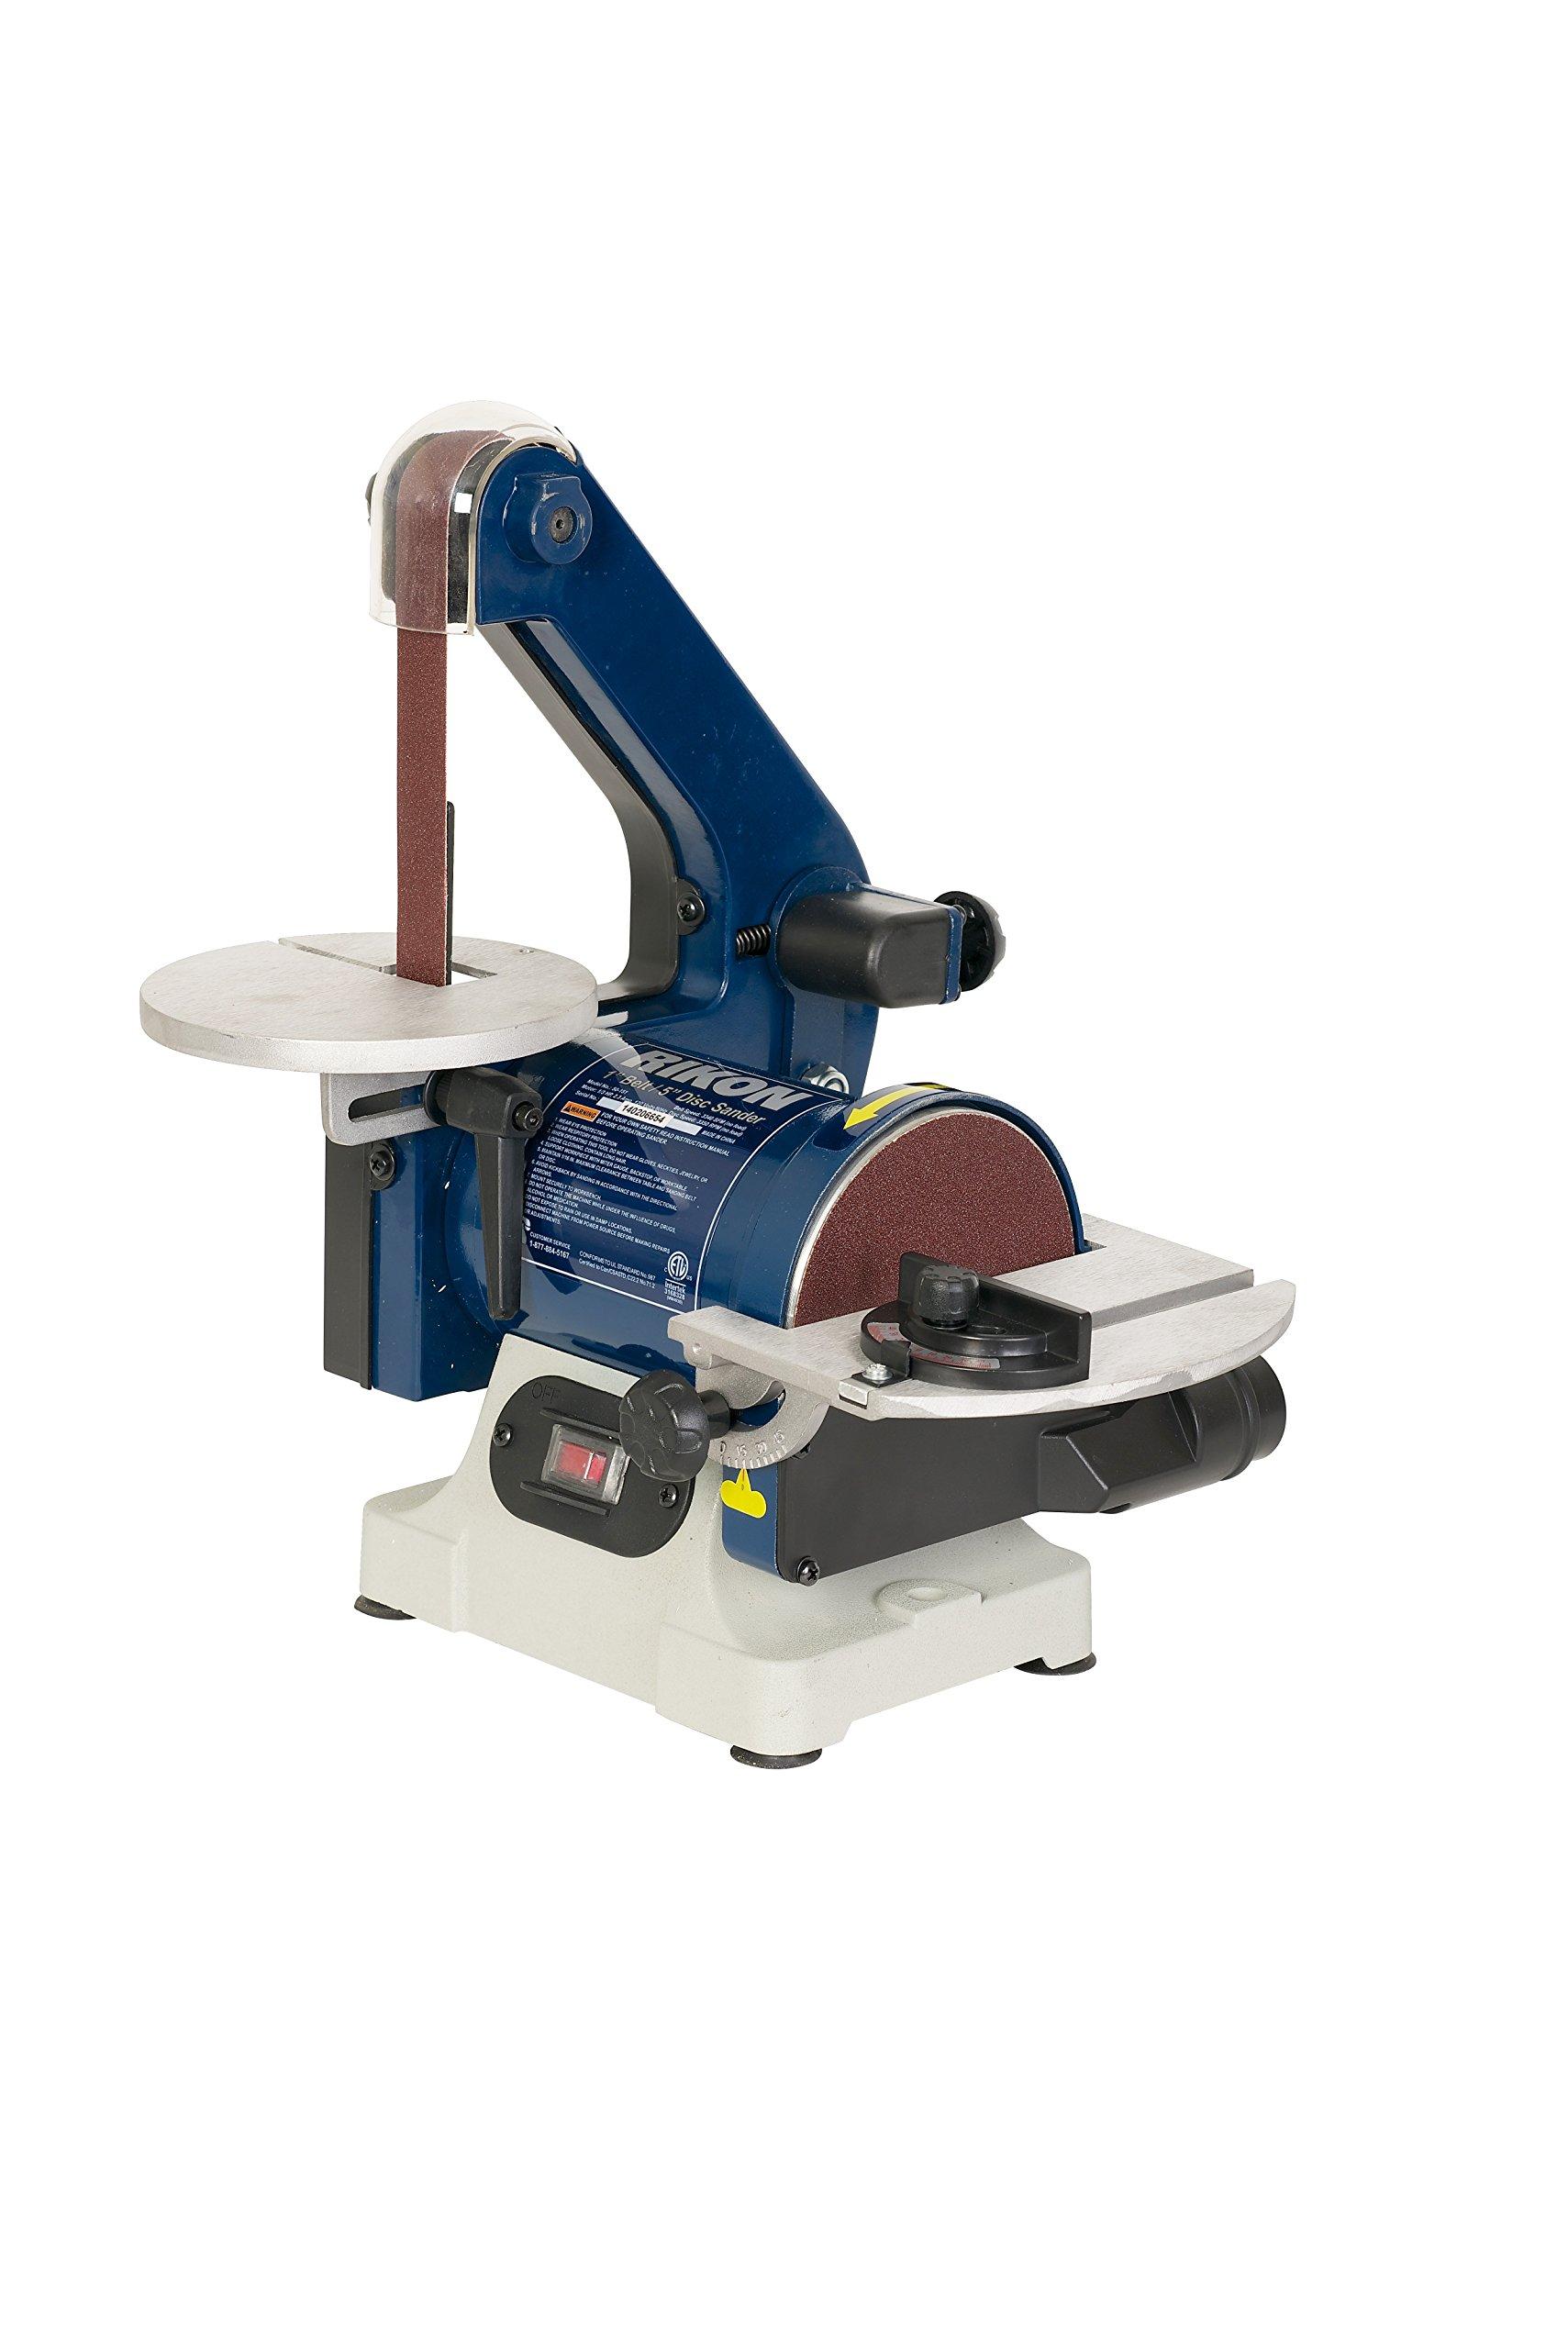 RIKON Power Tools 50 151 Sander